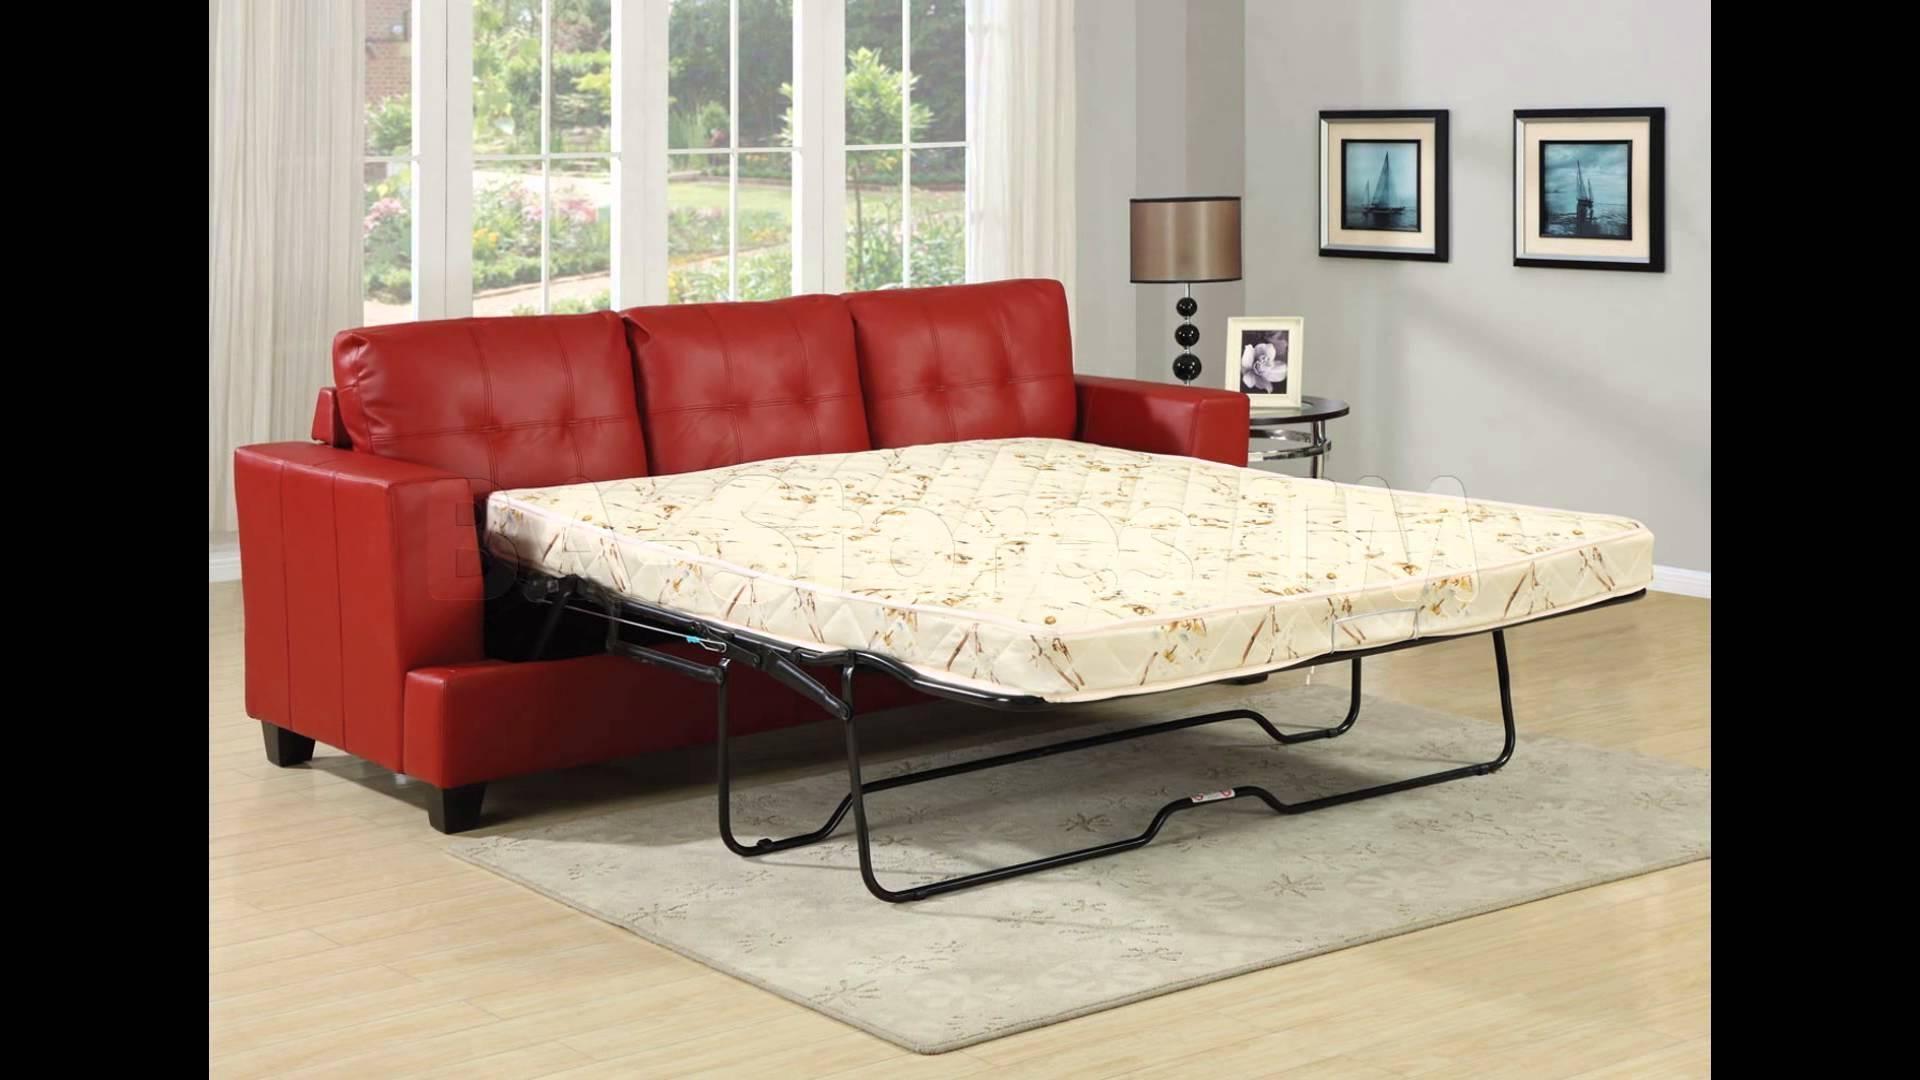 Sleeper Sofa   Sofa Sleeper   Sectional Sleeper Sofa – Youtube Regarding Red Sleeper Sofa (View 14 of 20)